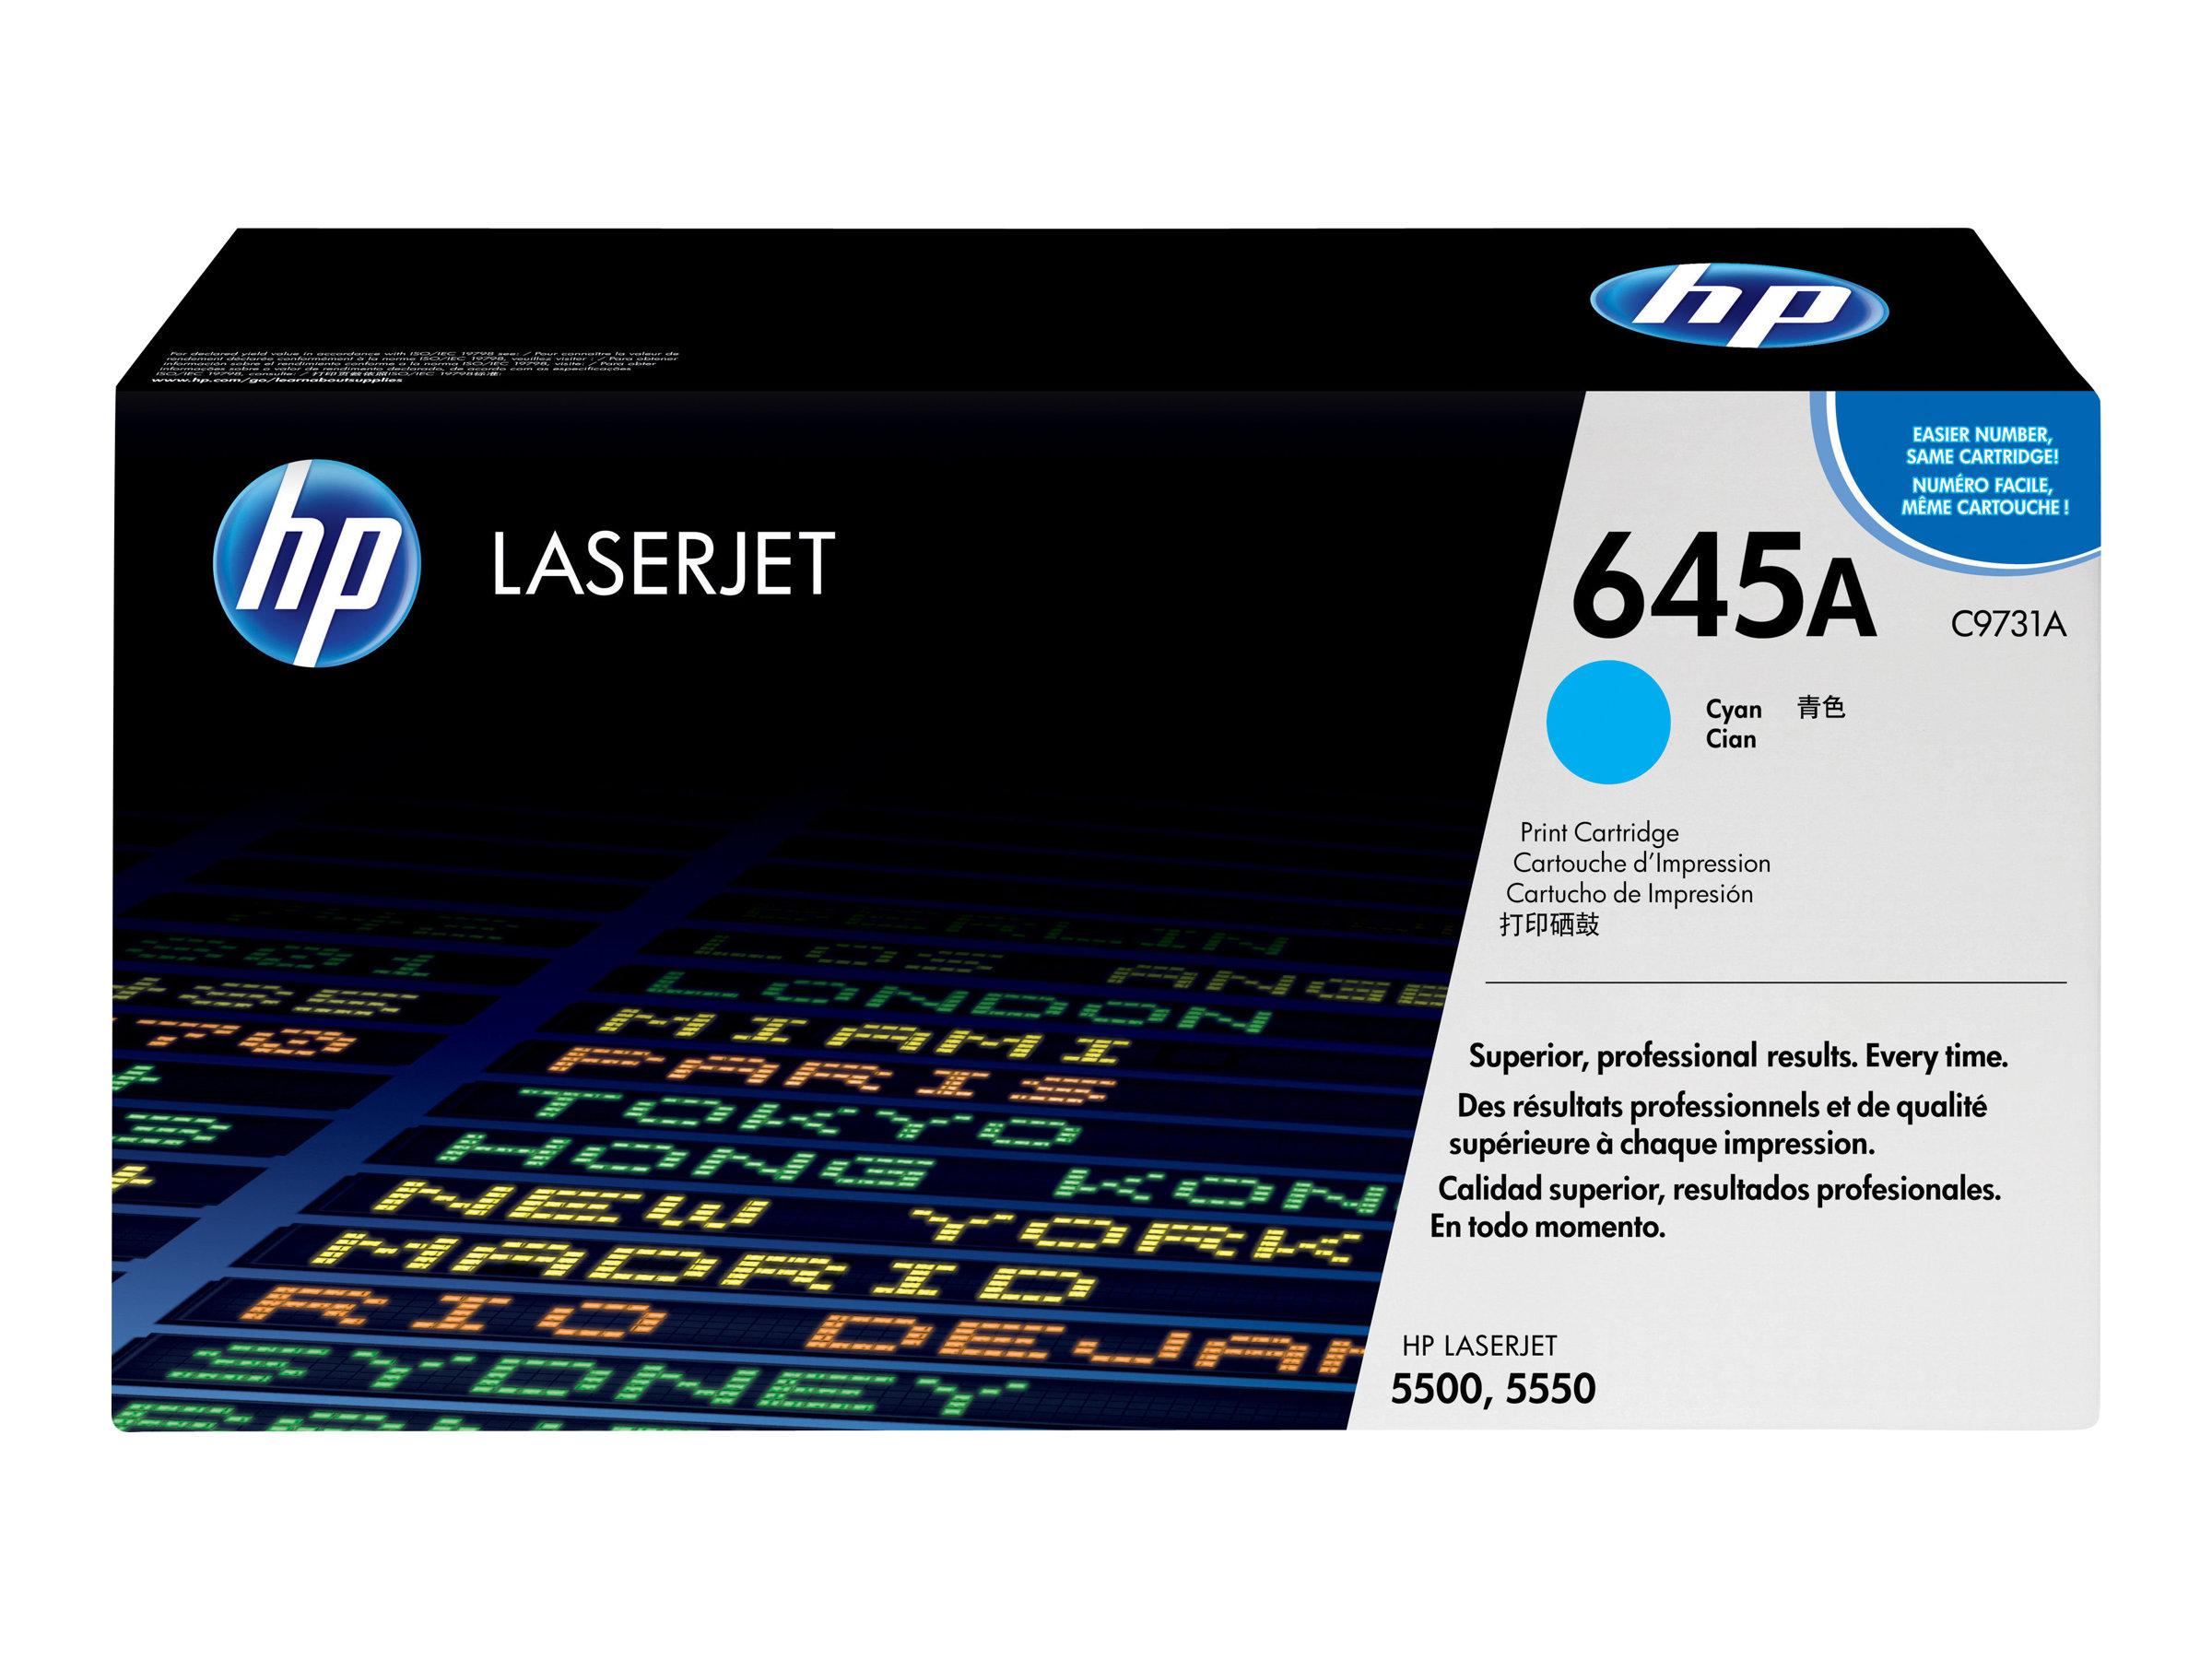 HP 645A - Cyan - Original - LaserJet - Tonerpatrone (C9731A) - für Color LaserJet 5500, 5550